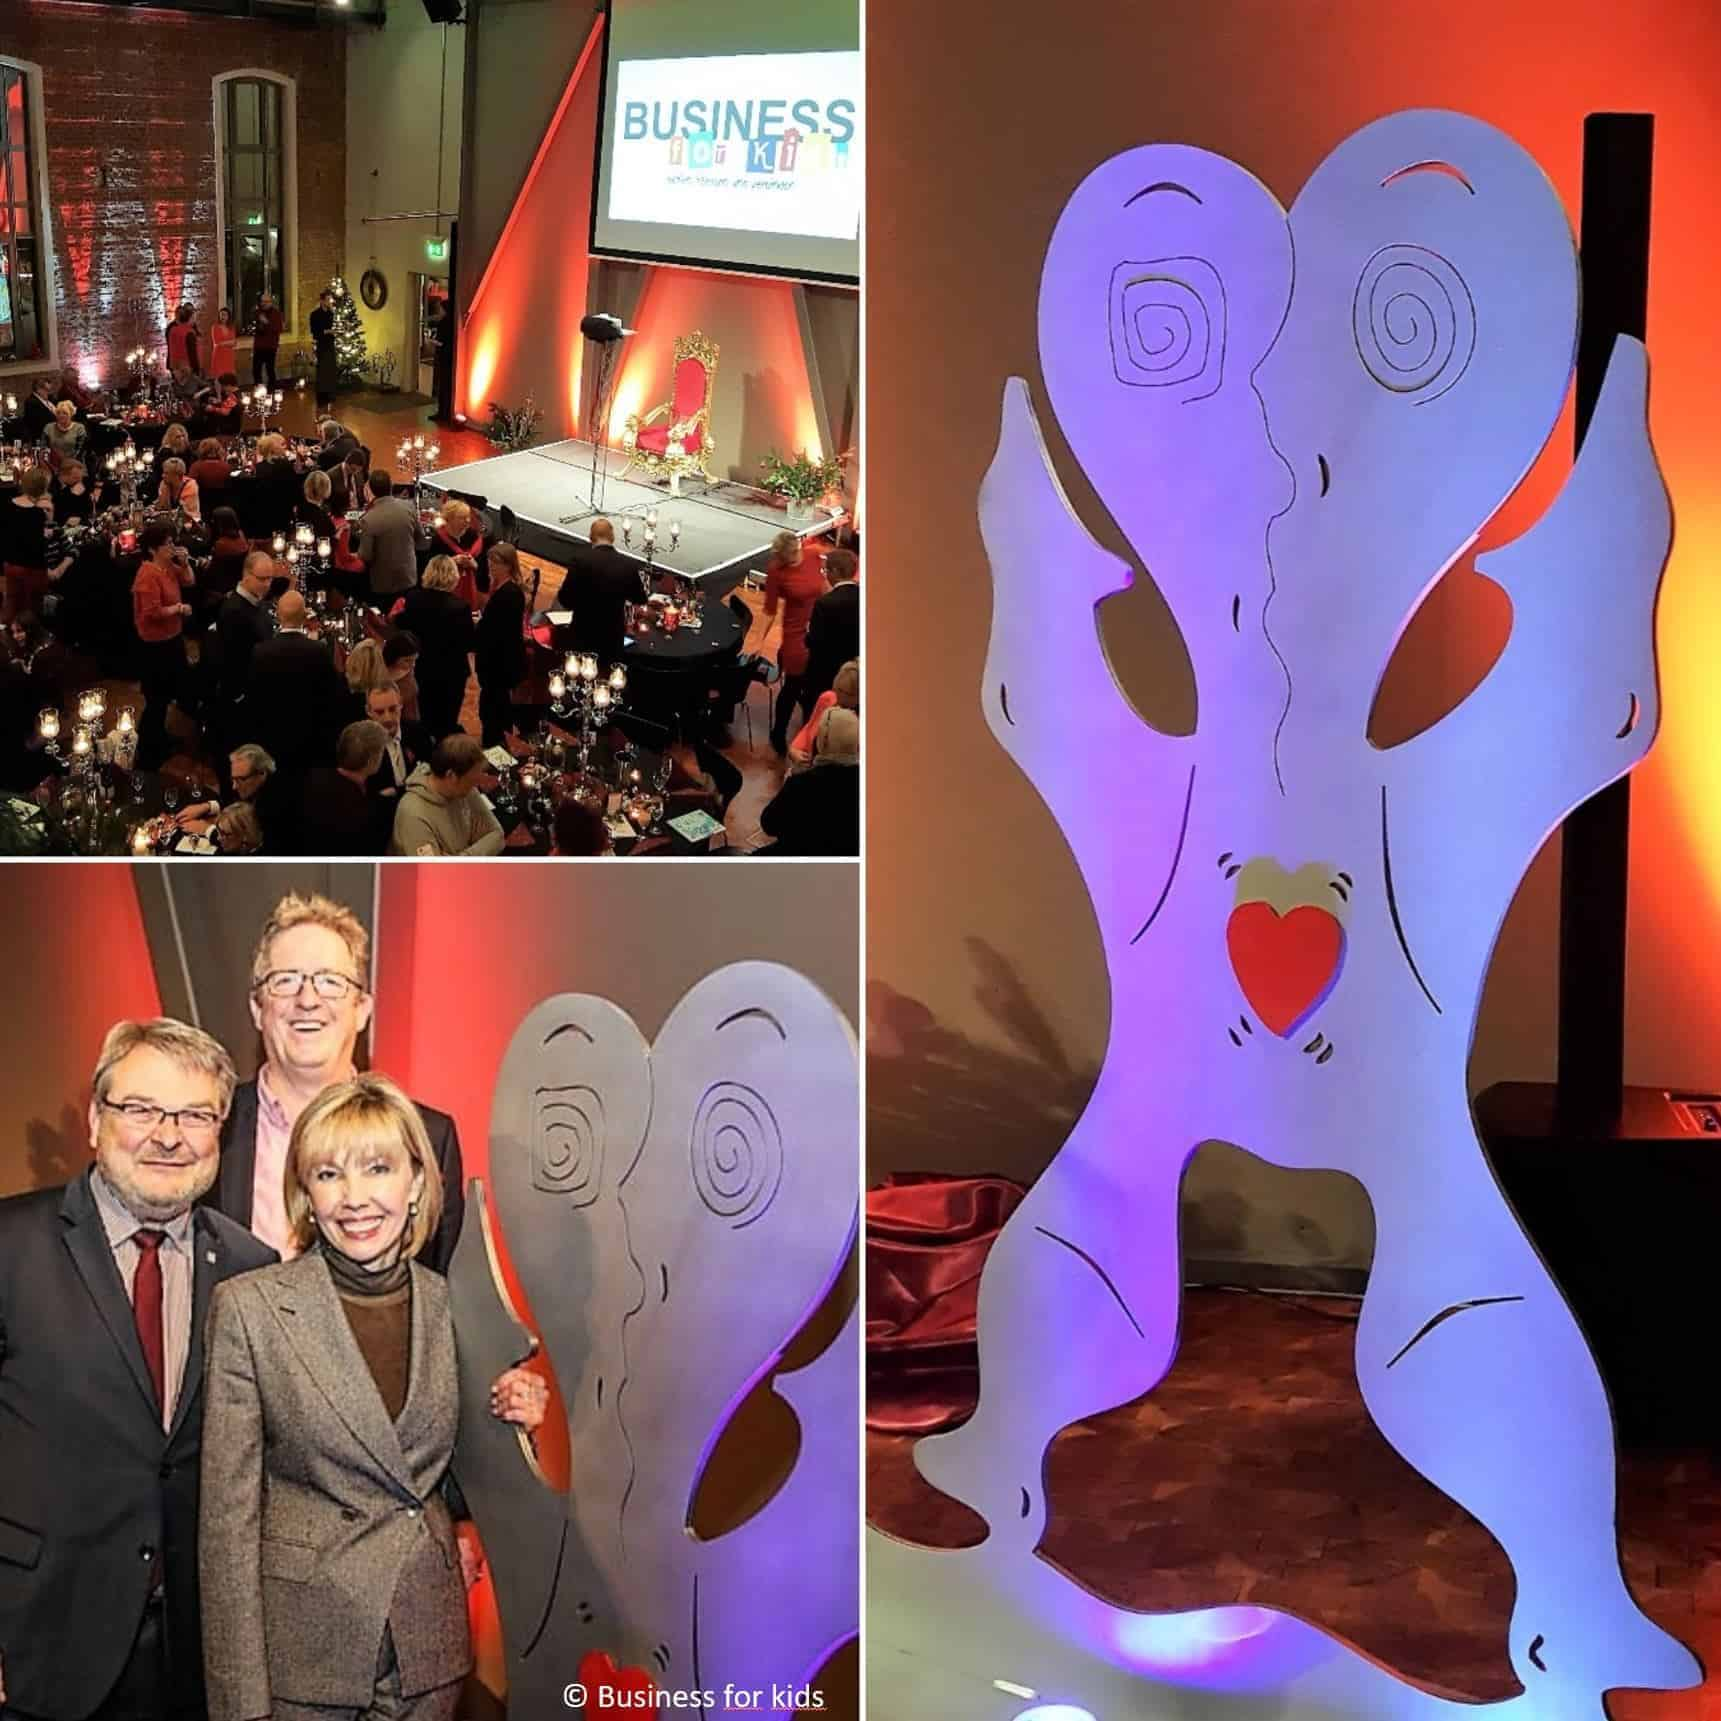 style hannover business for kids tulifurdum2017 - Business for Kids - Kinderaugen leuchten lassen